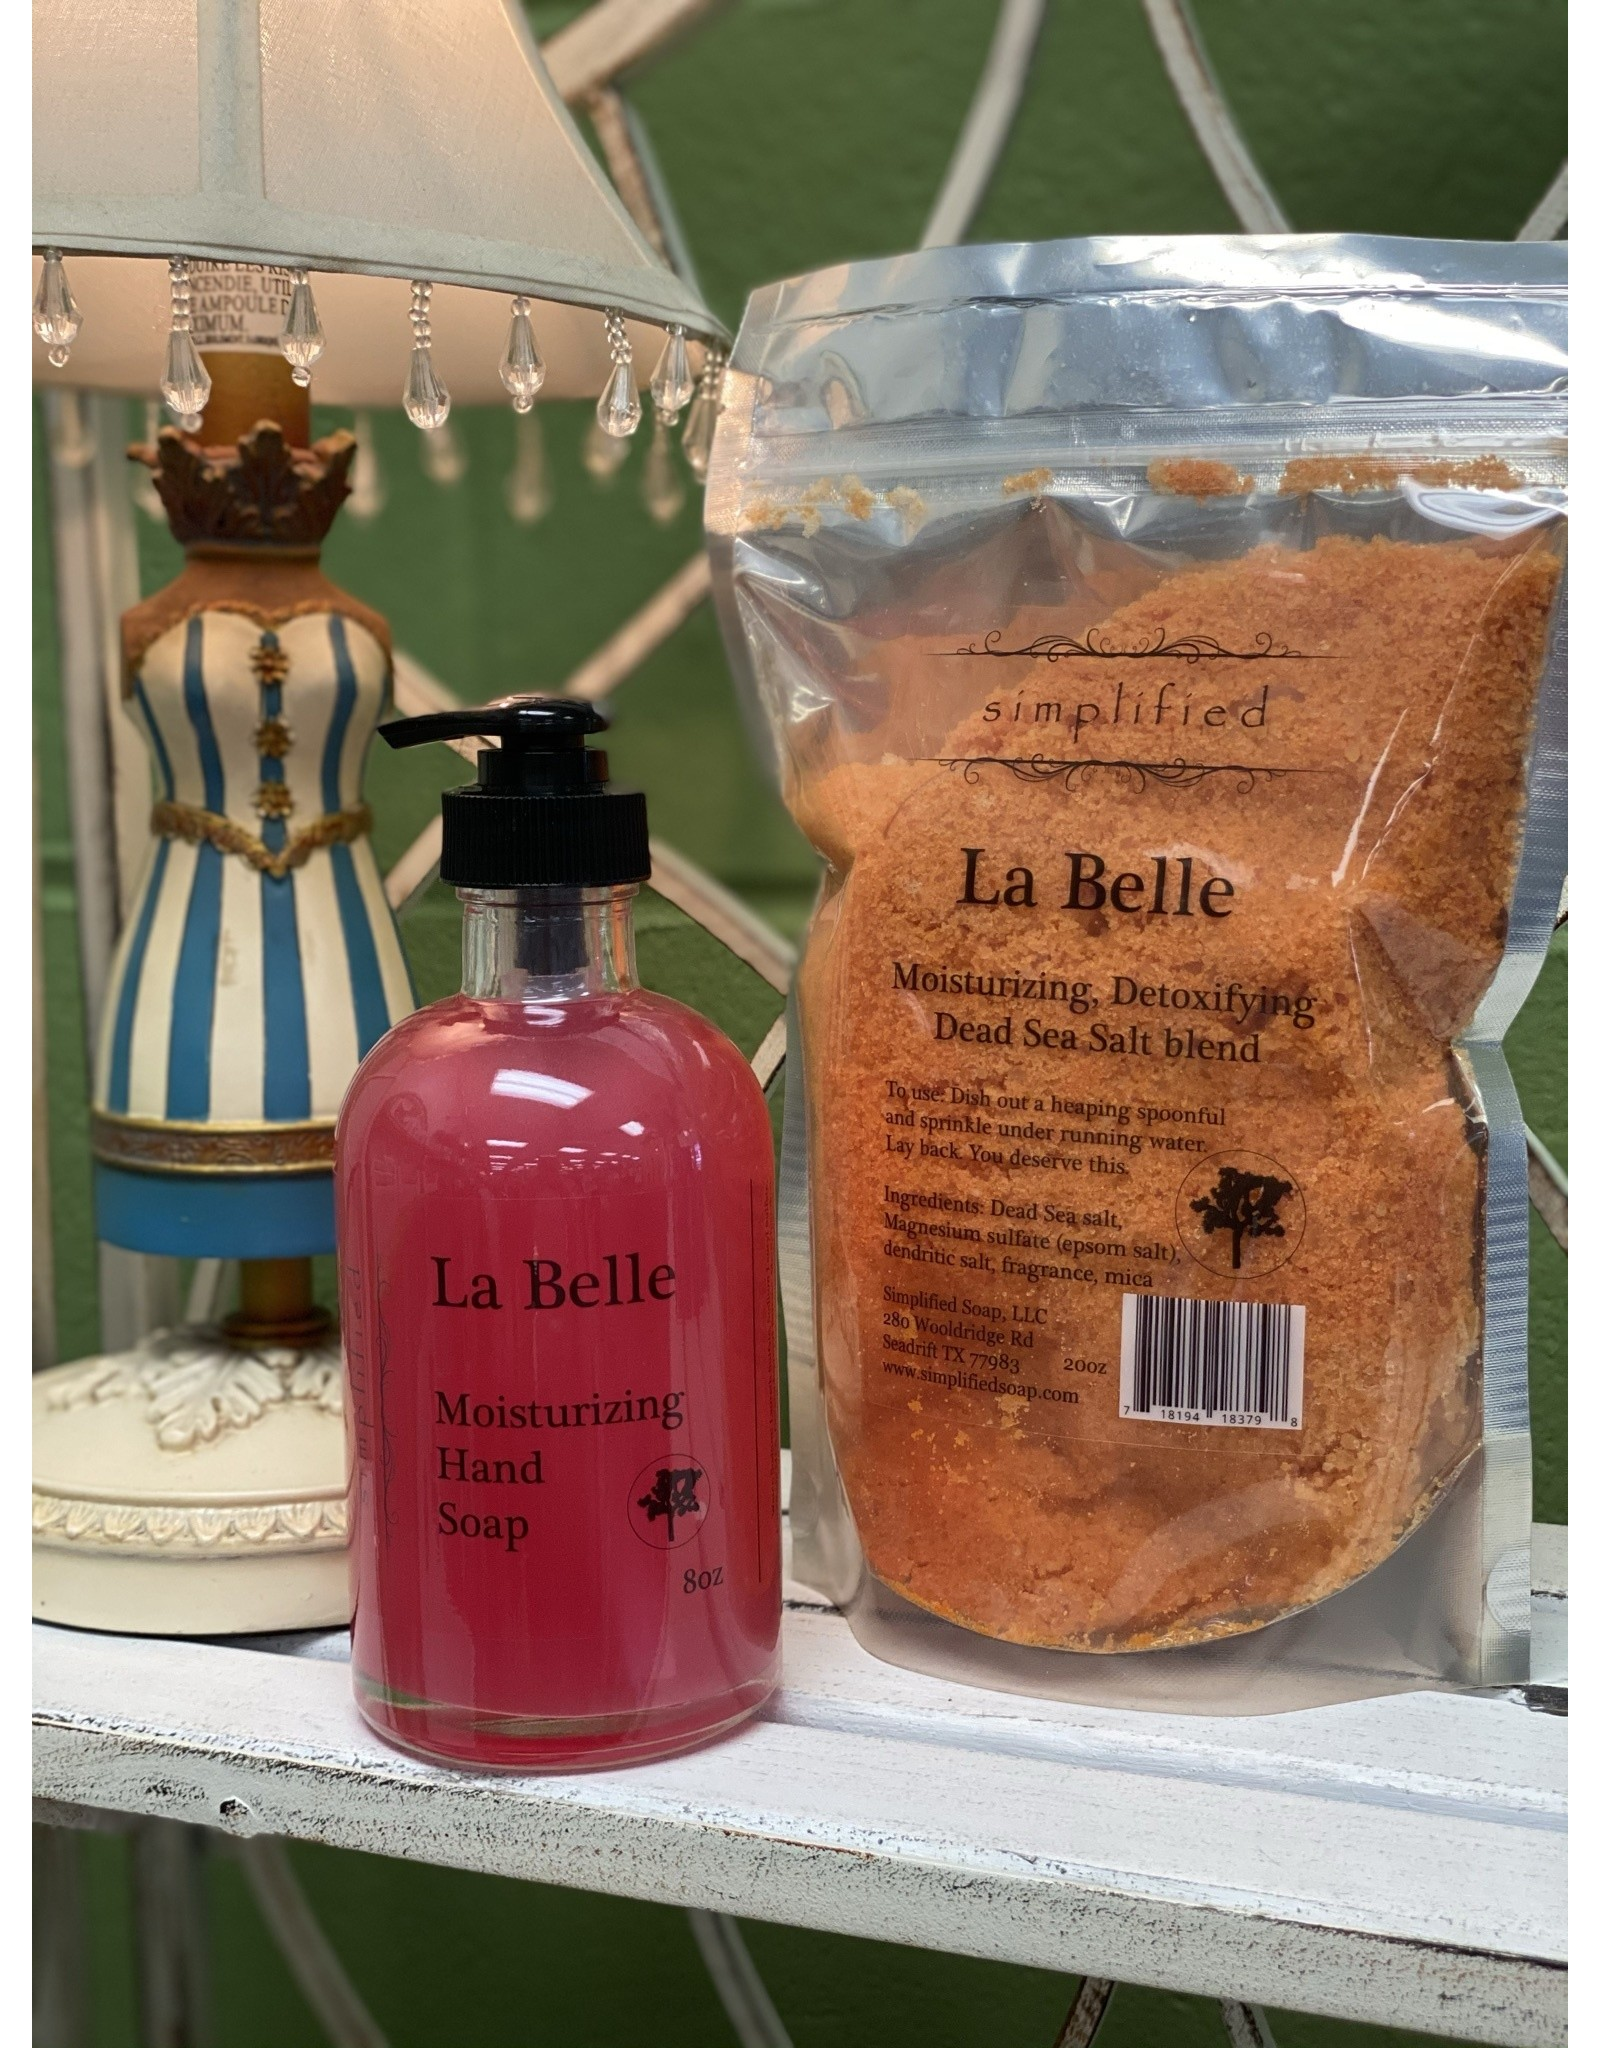 LaBelle Moisturizing Hand Soap 8oz